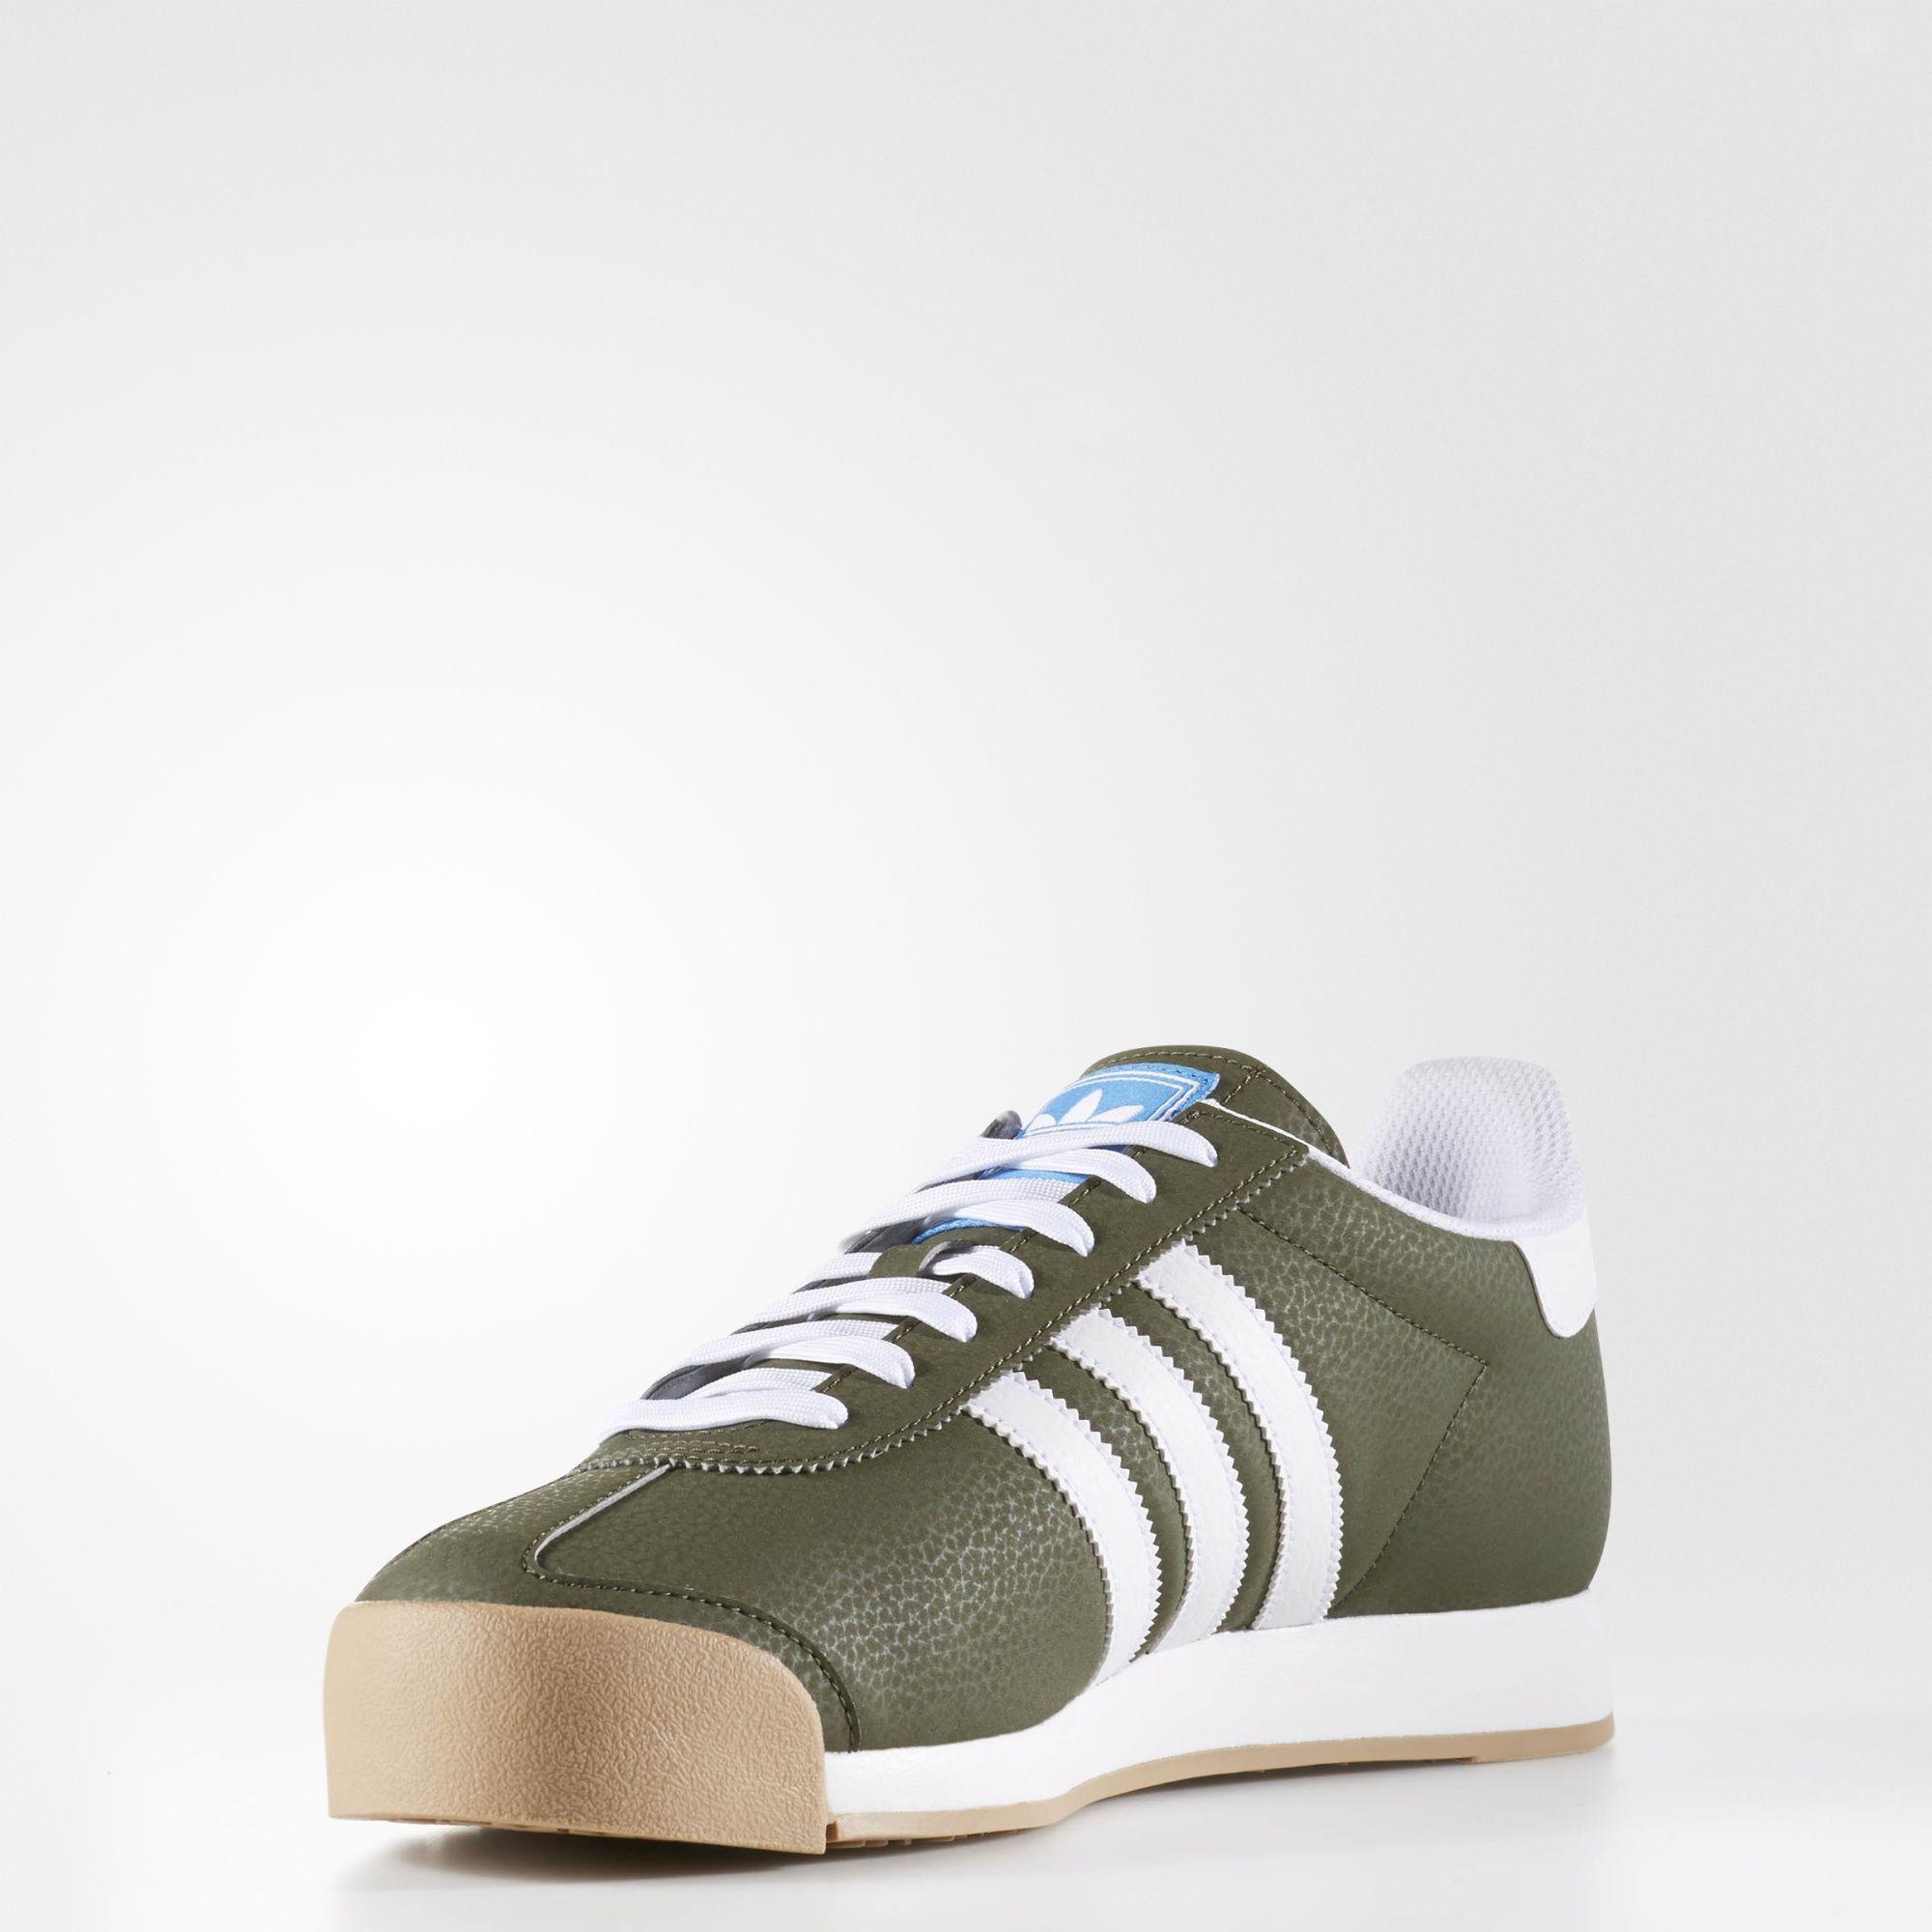 adidas samoa scarpe scarpe da uomo pinterest adidas